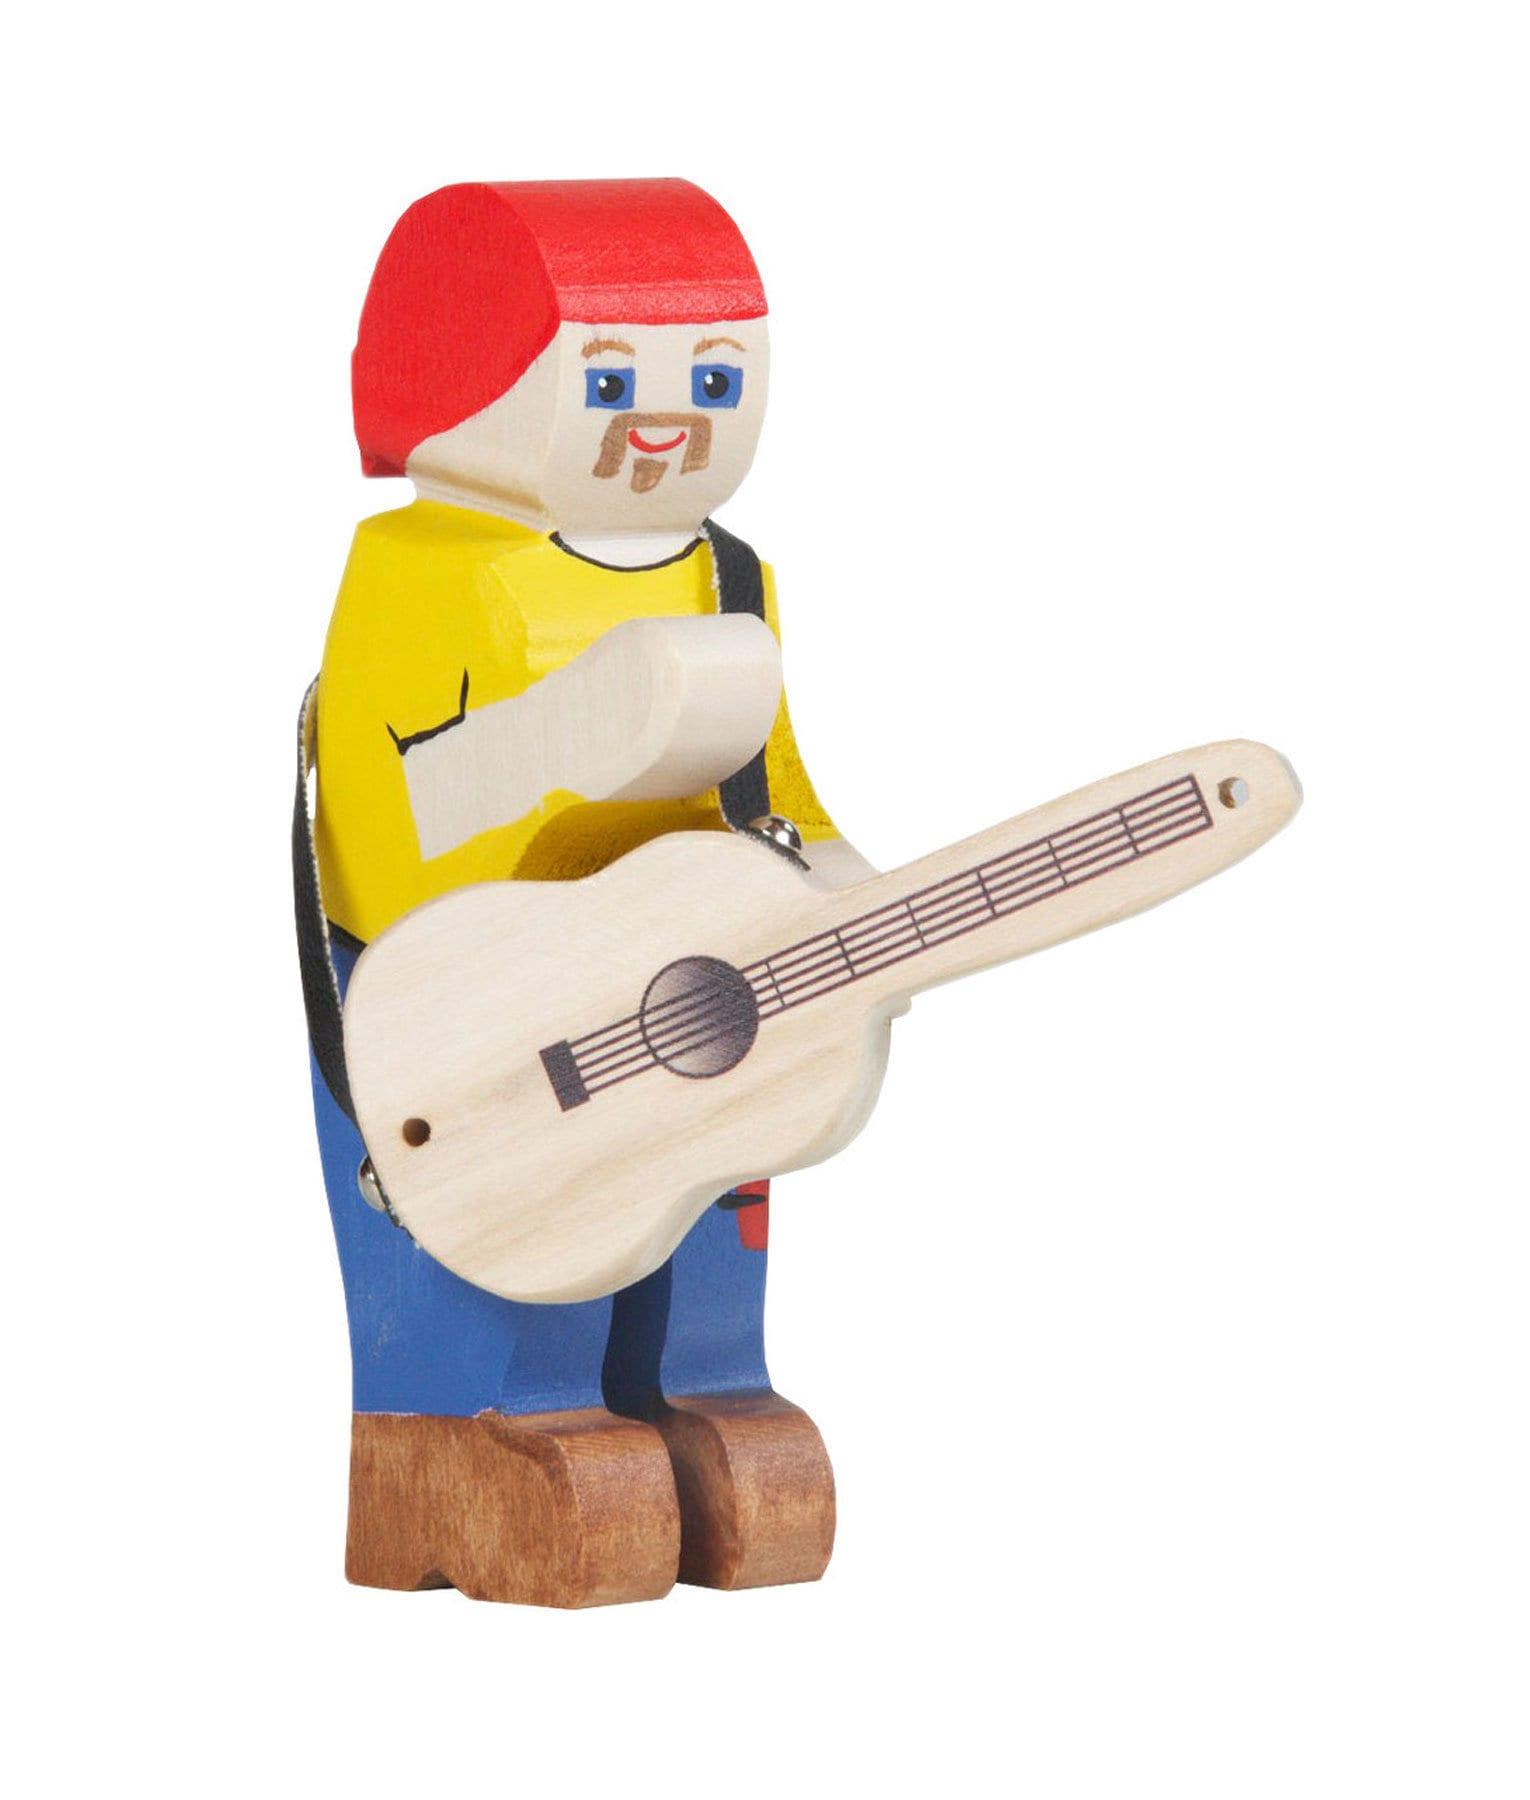 PAPAGALLO-GOLLO-Trauffer-Wooden-Toys